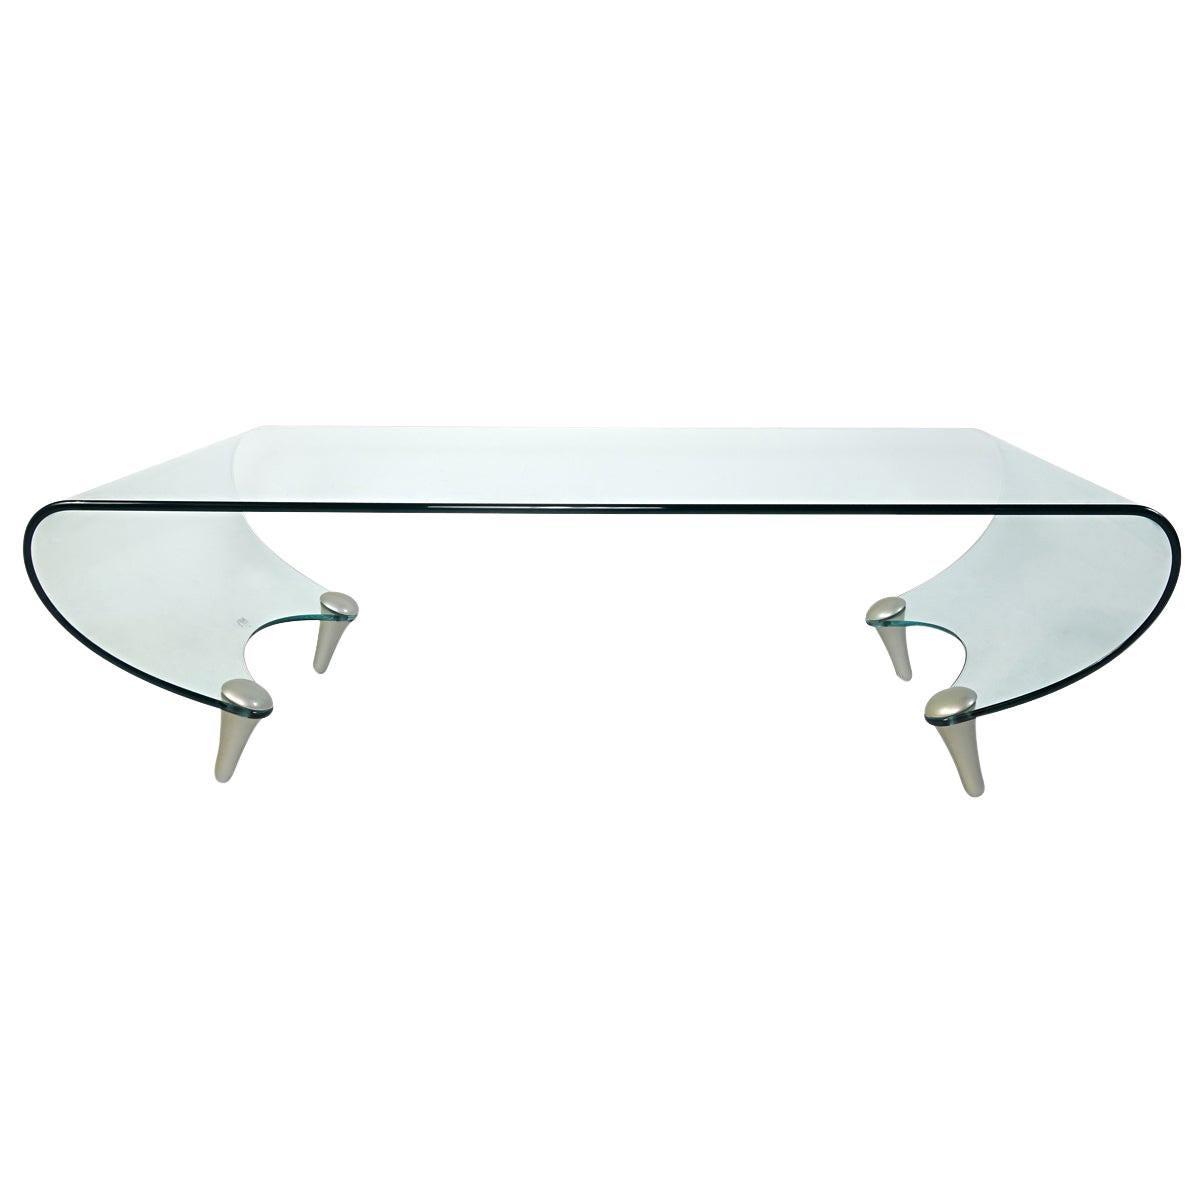 Postmodern Glass Coffee Table Tango by Fabio Di Bartolomei for Fiam Italia